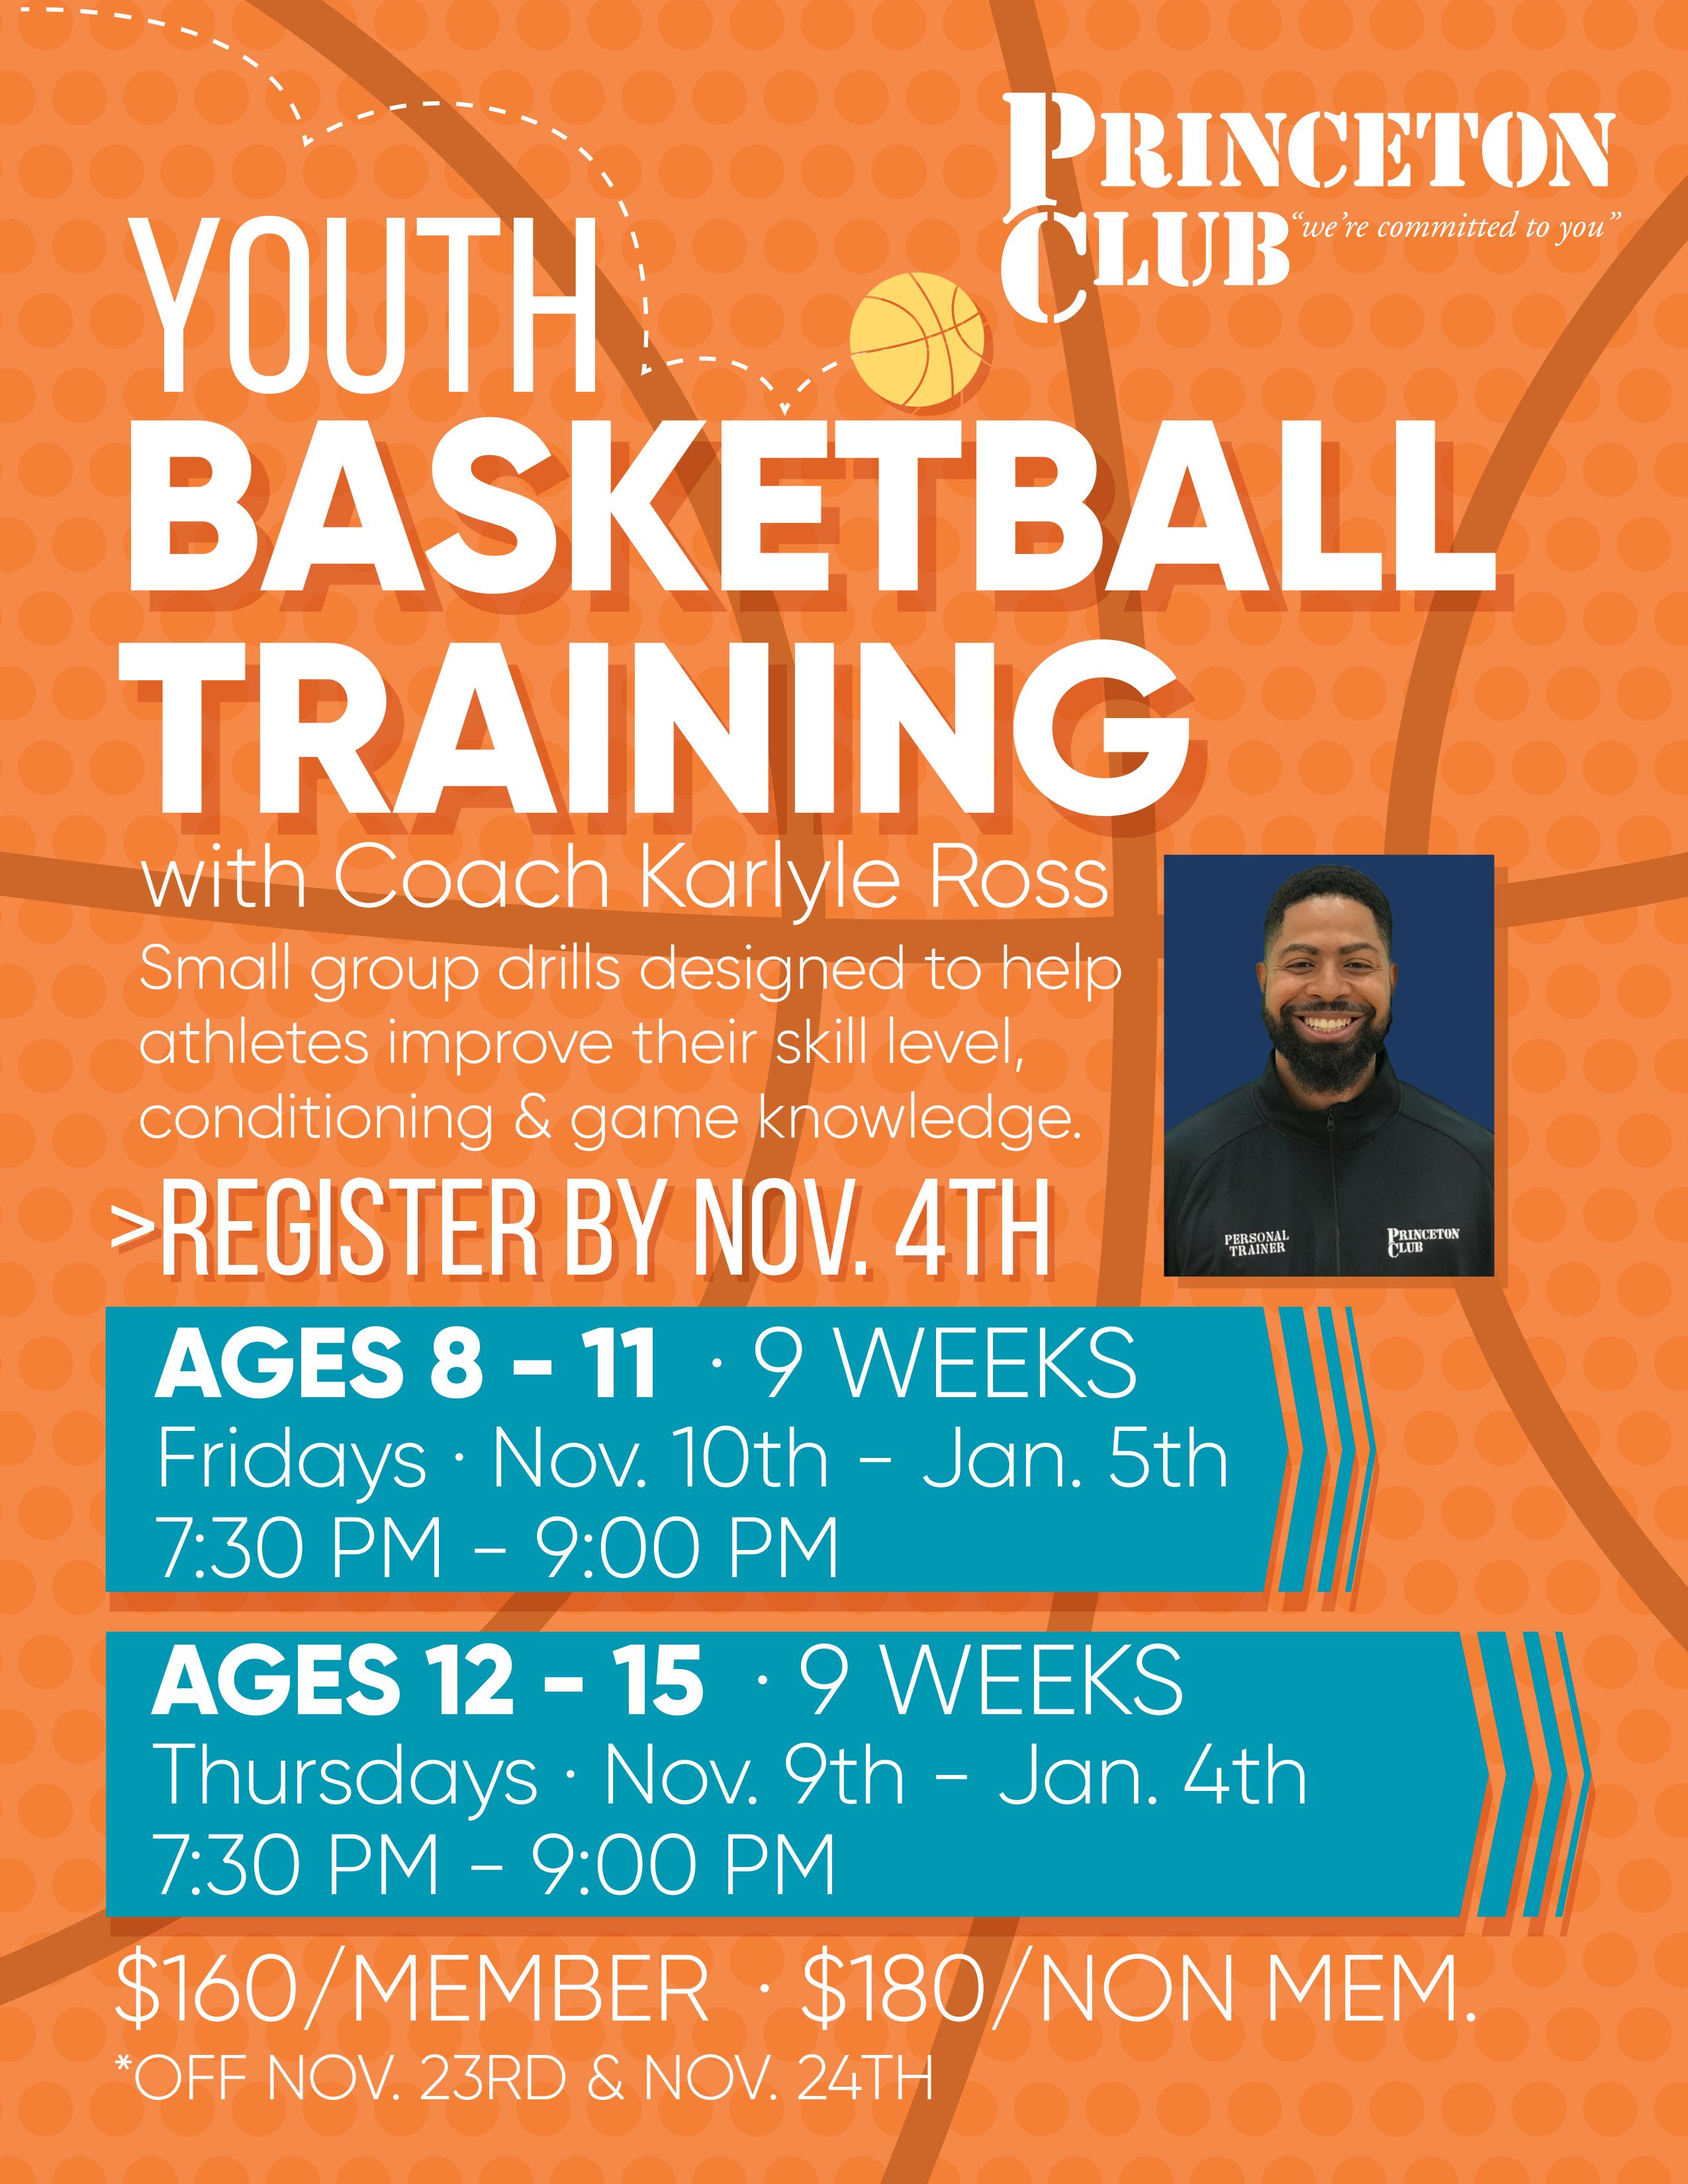 Youth Basketball Training Flyer